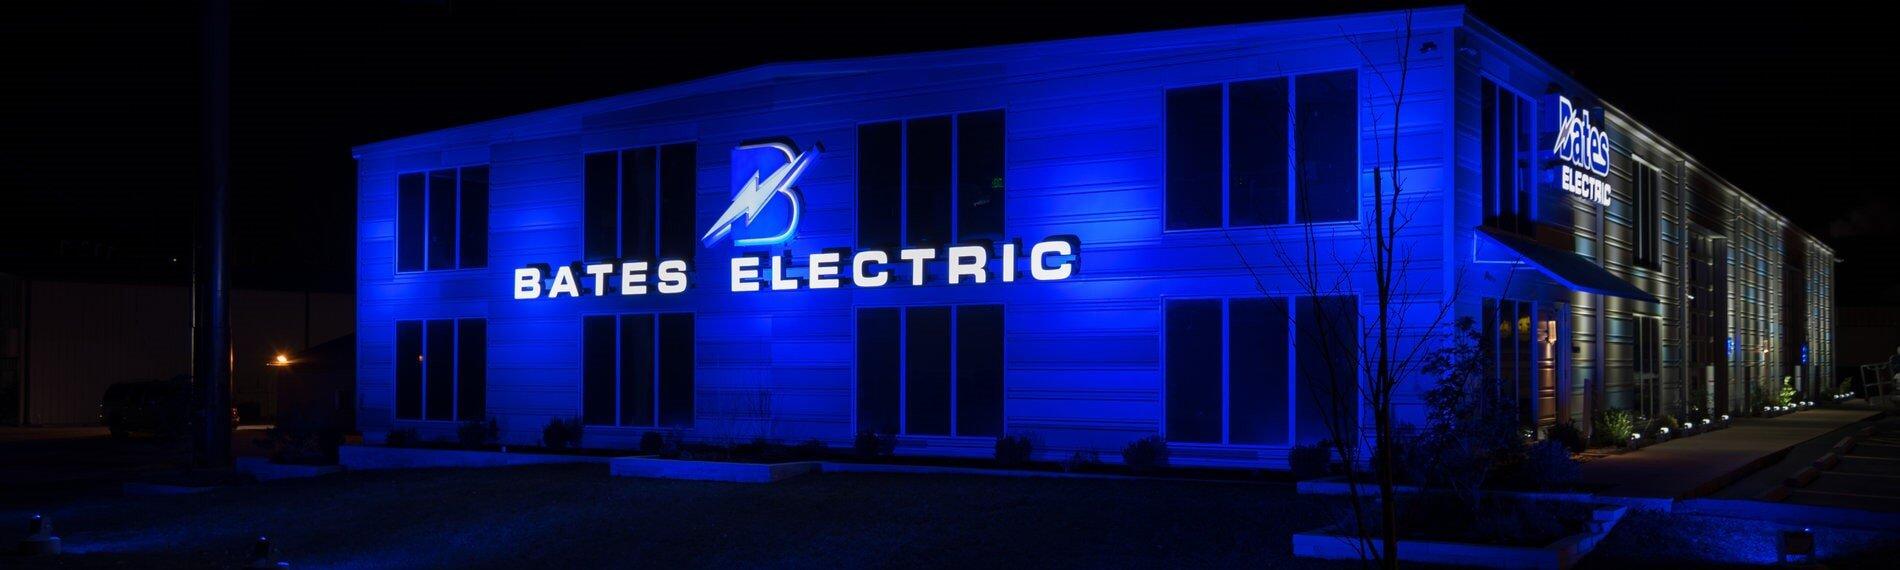 Electrical Contractors Electricians Generators Amp Light